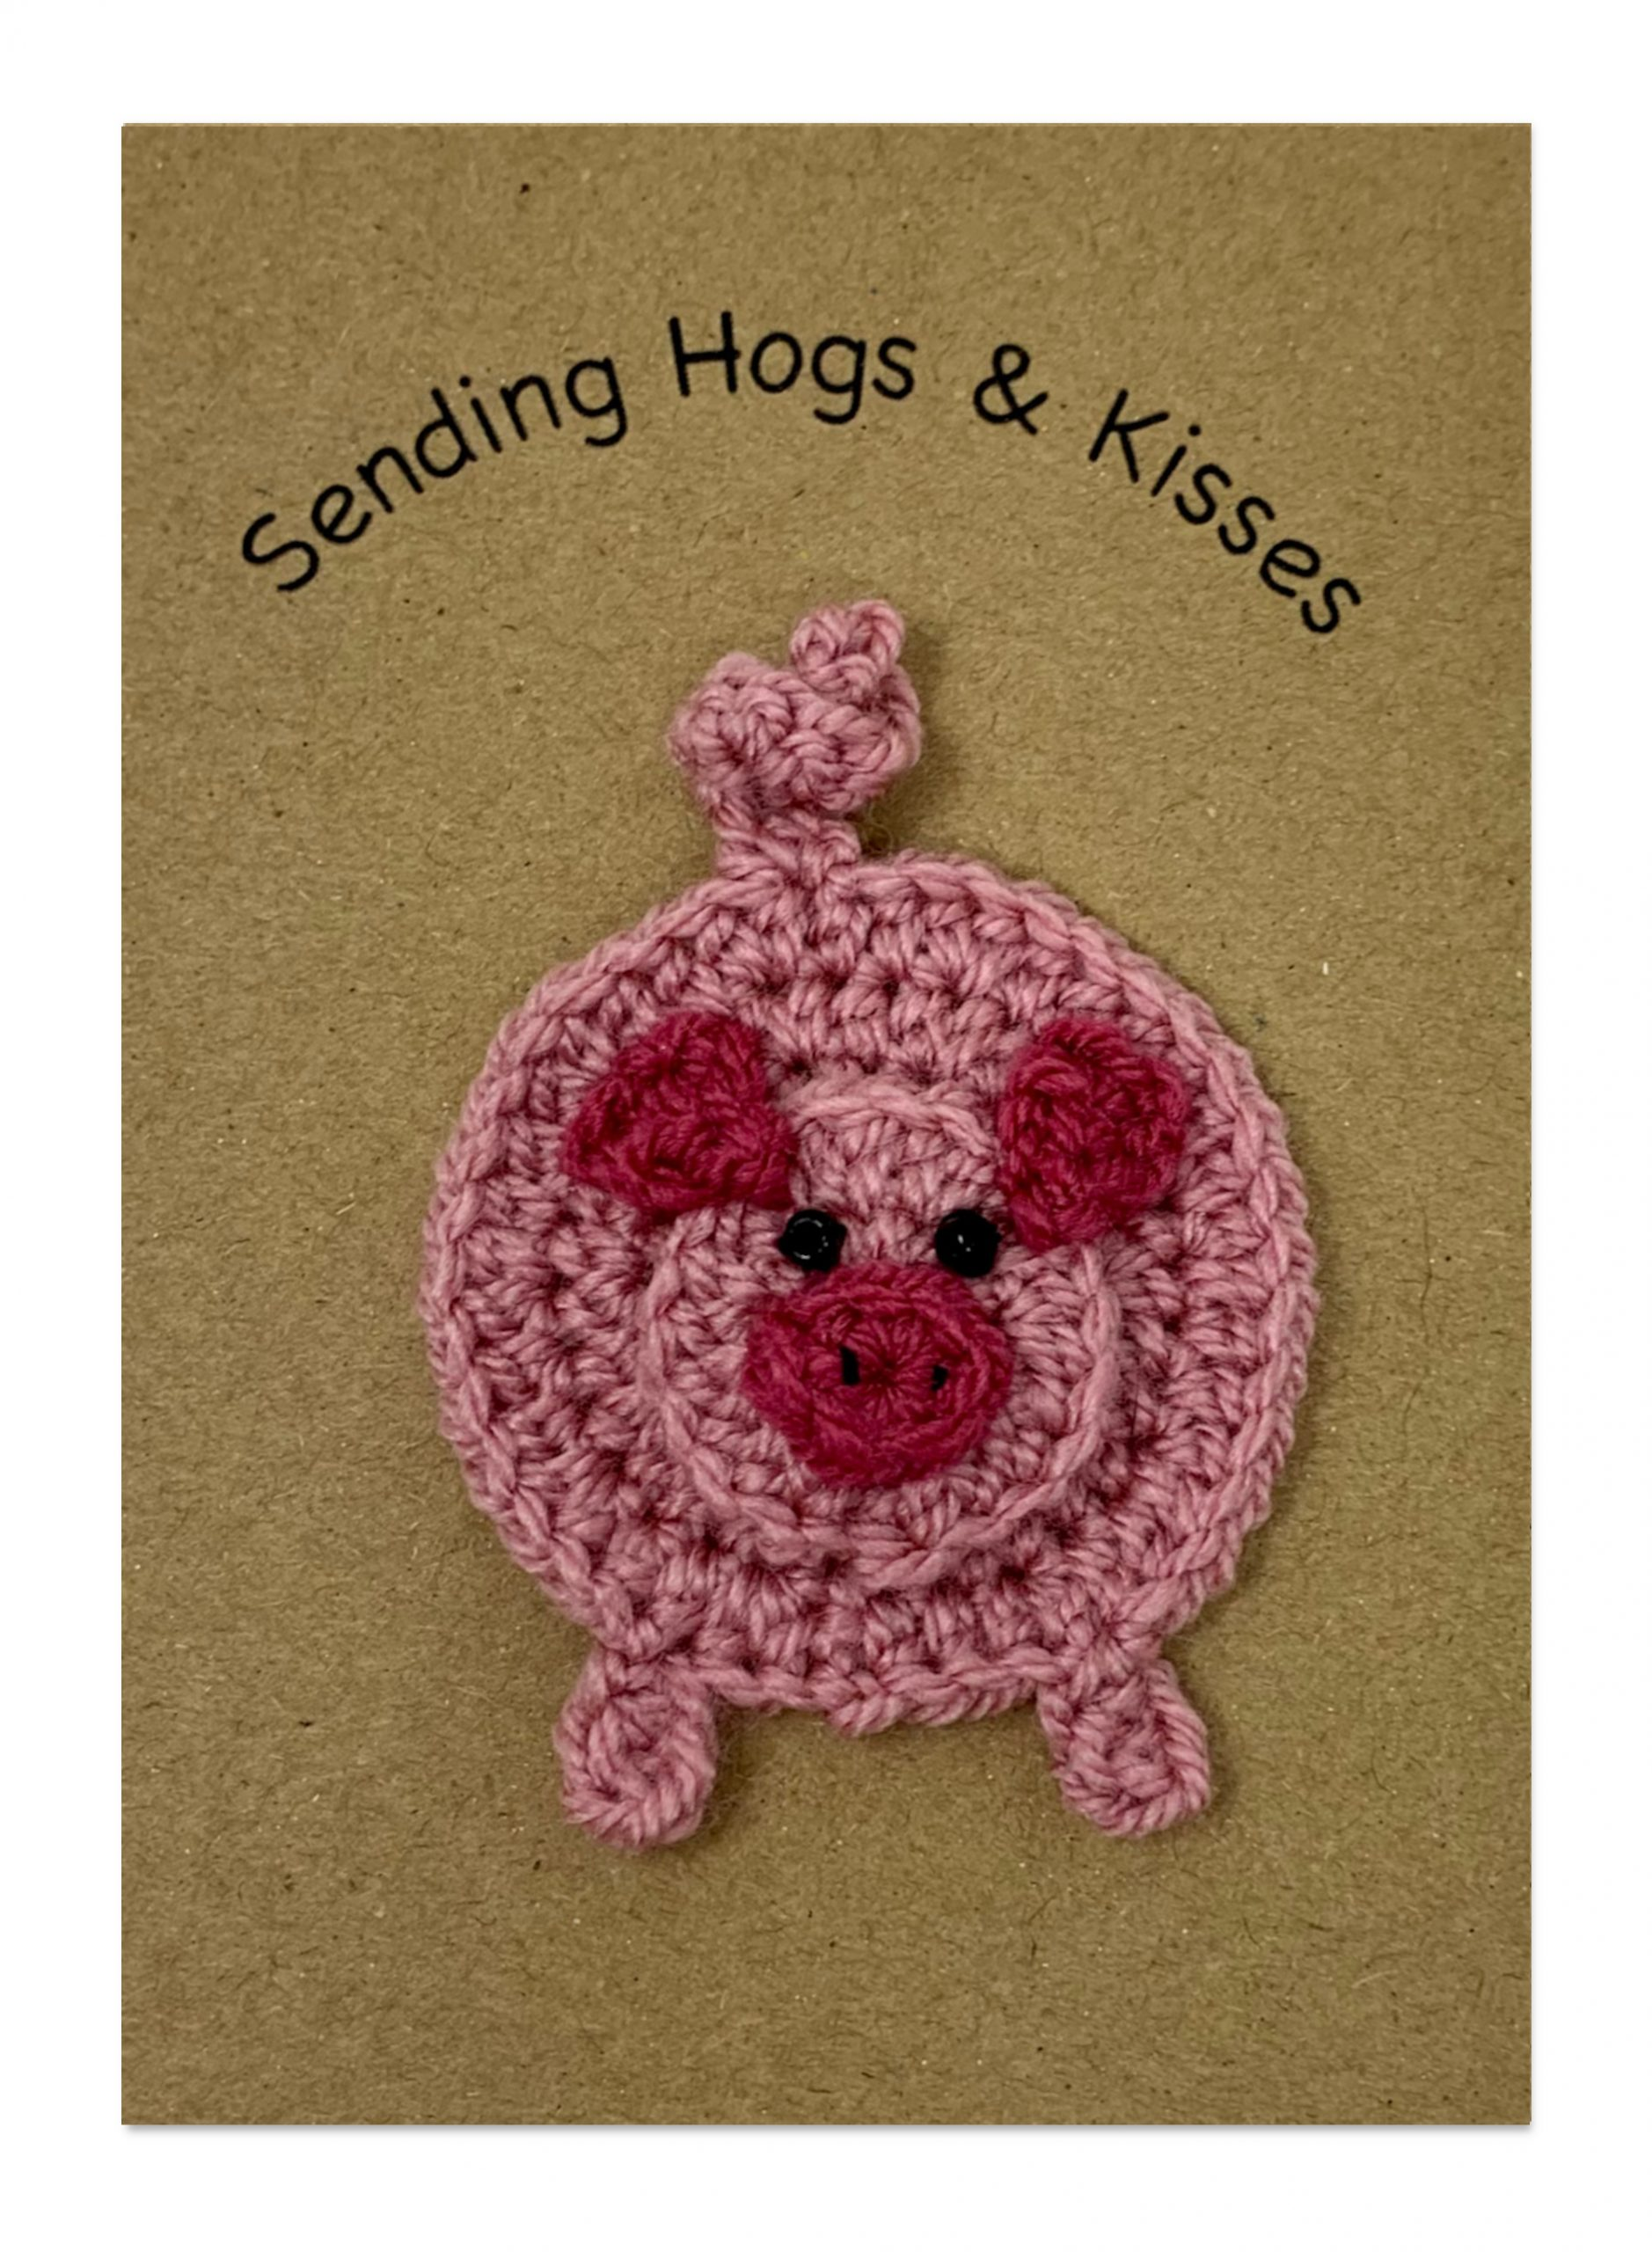 Hogs - edited